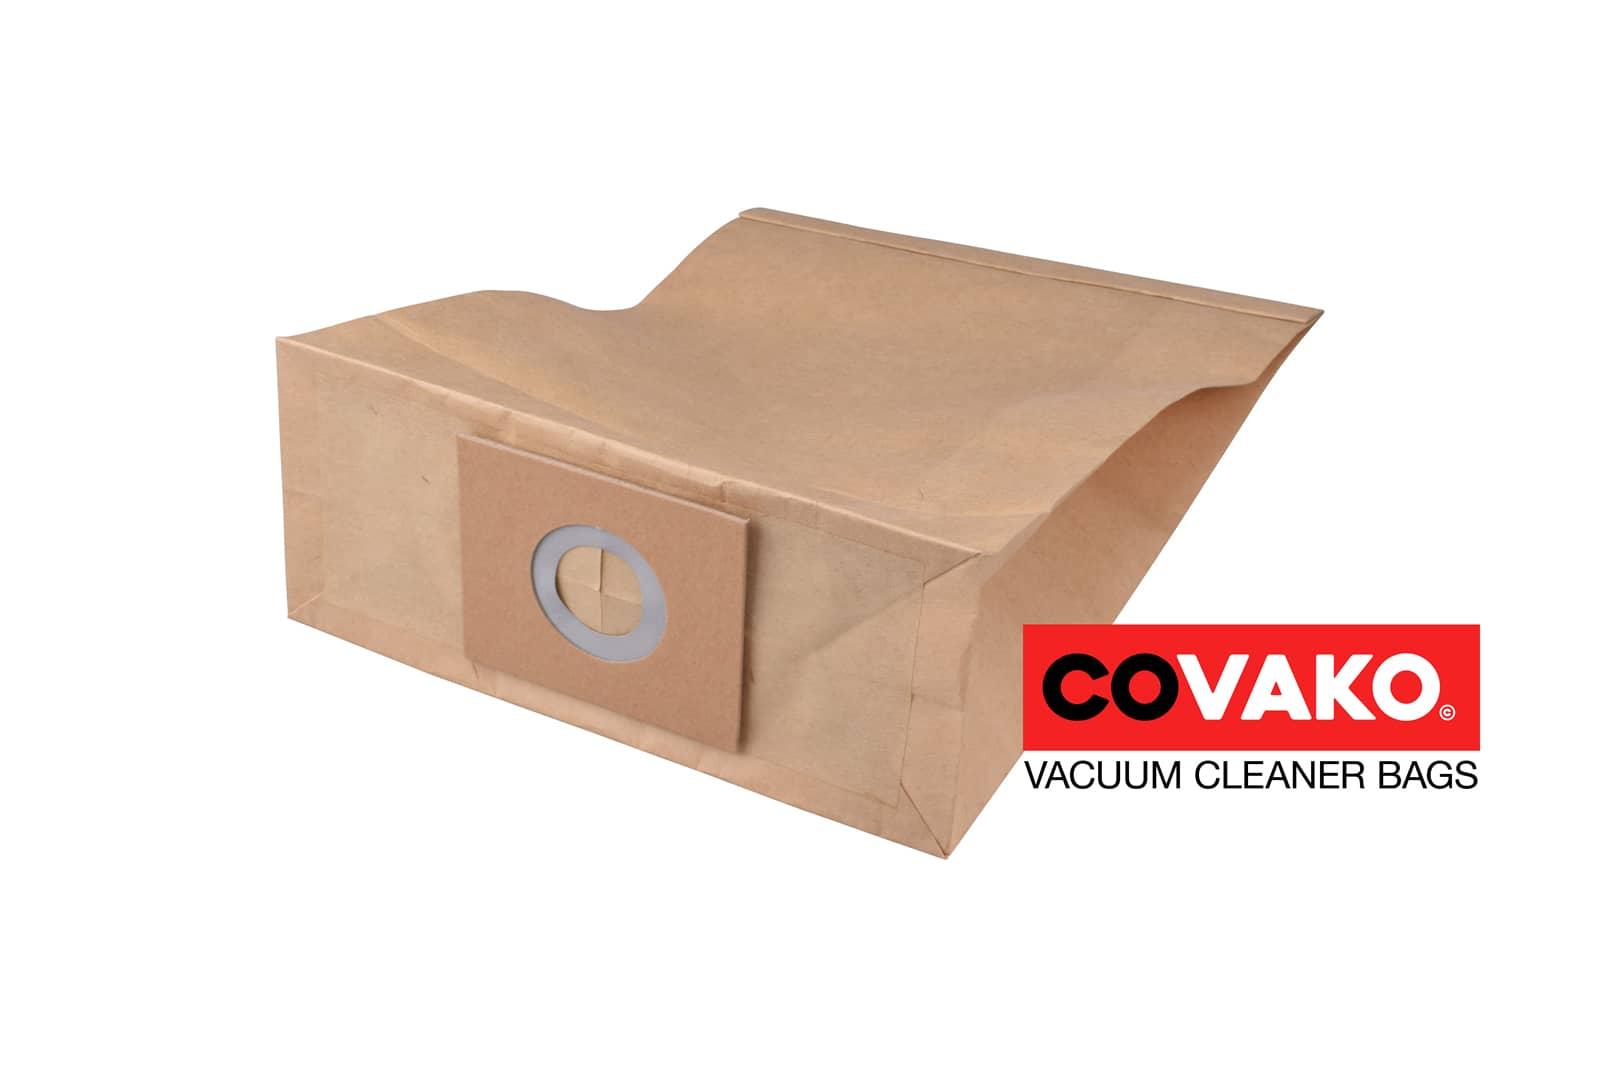 I-vac Dryver 10R / Paper - I-vac vacuum cleaner bags